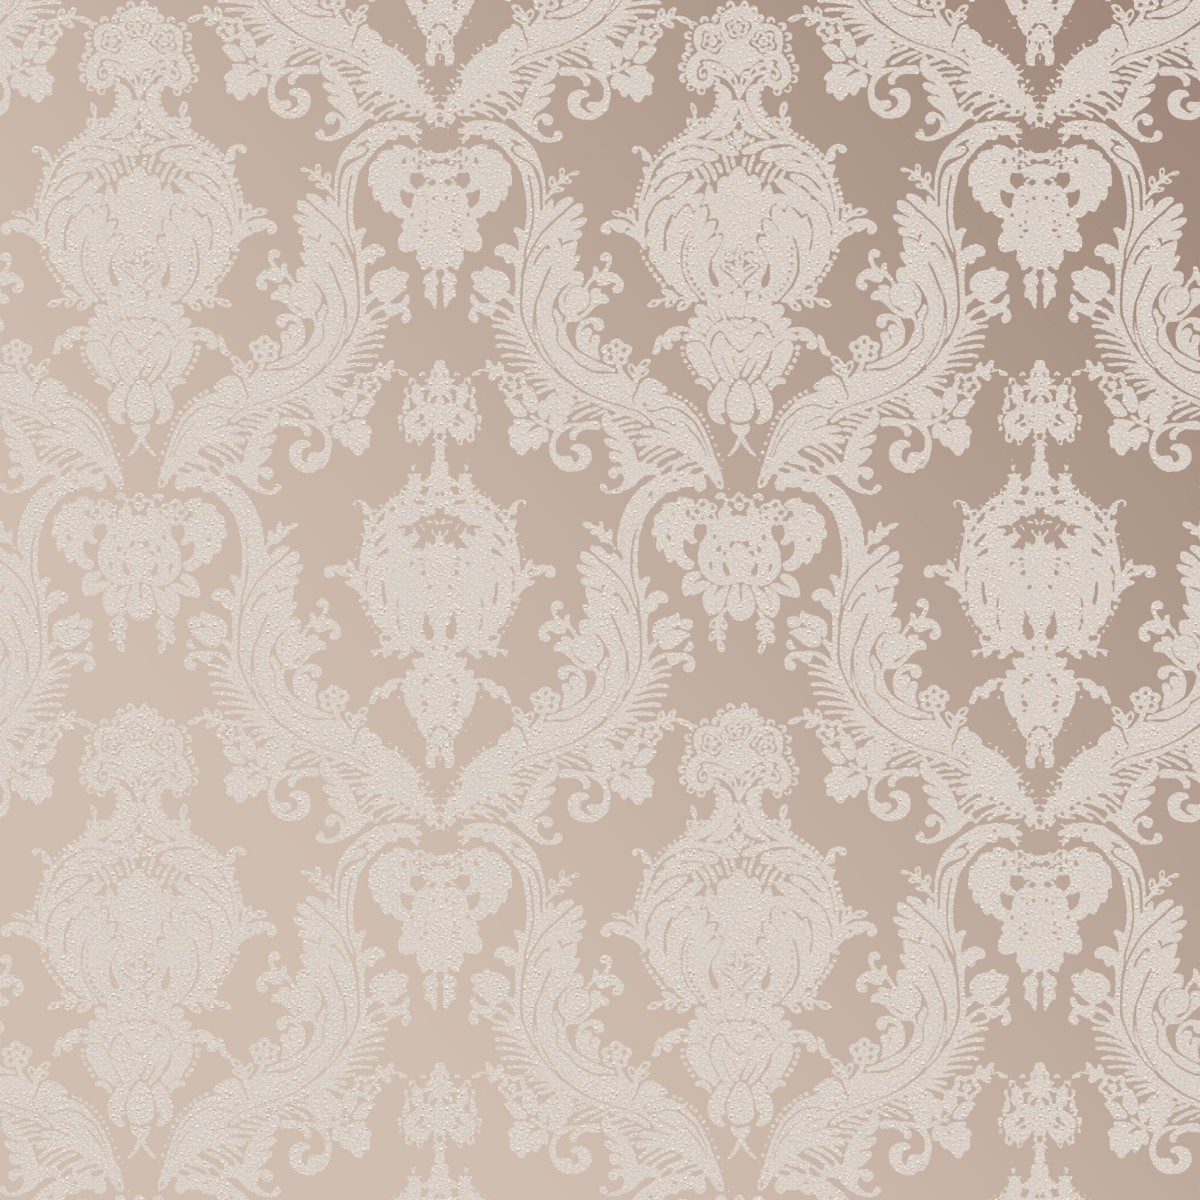 DAMSEL Bisque   TEMPAPER TEXTURED   SHOP   Tempaper Designs 1200x1200